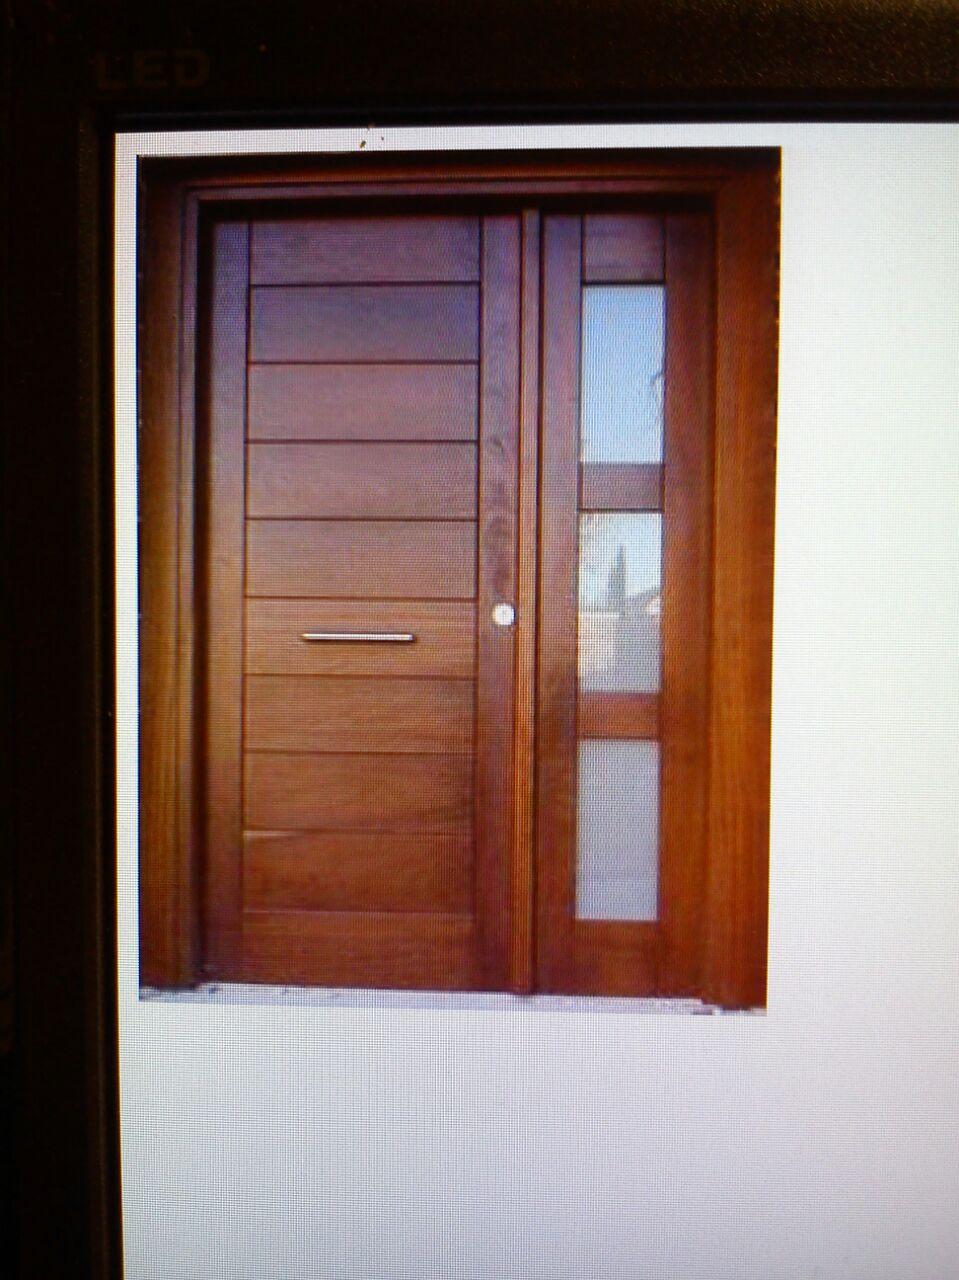 Ventanas de aluminio zaragoza ventanas de pvc zaragoza cerramientos a medida cambiar ventanas - Persianas aragon ...